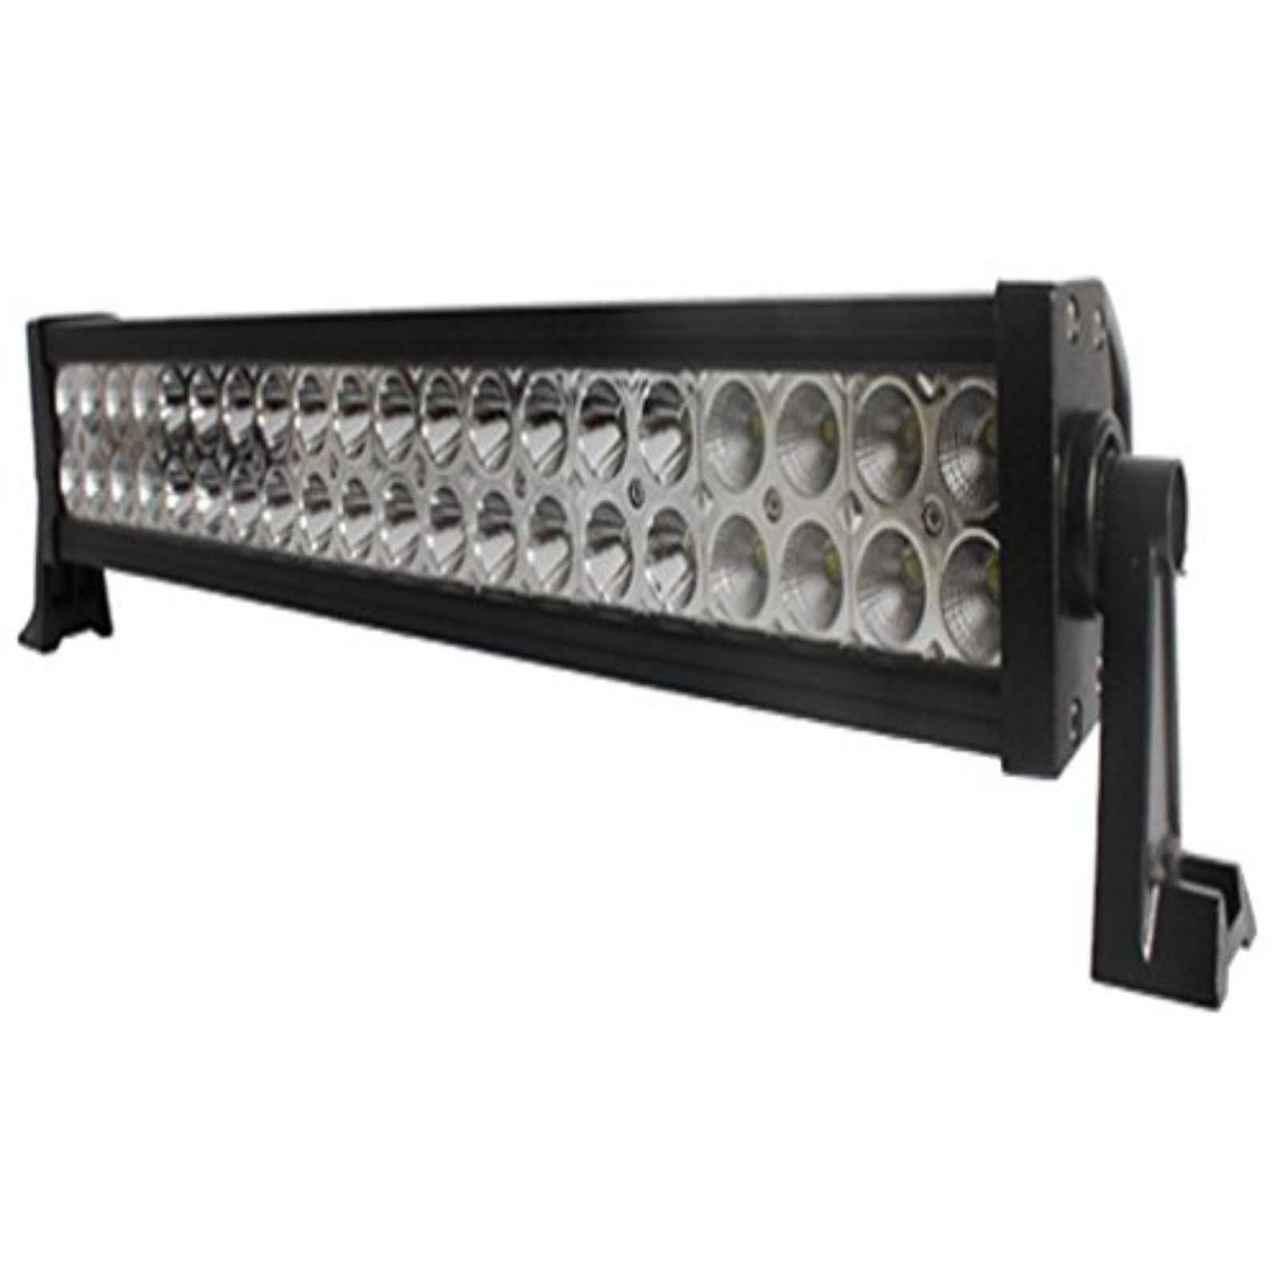 Cyclopse Light Bar 31 5 Quot 180w 13 500 Lumens Three